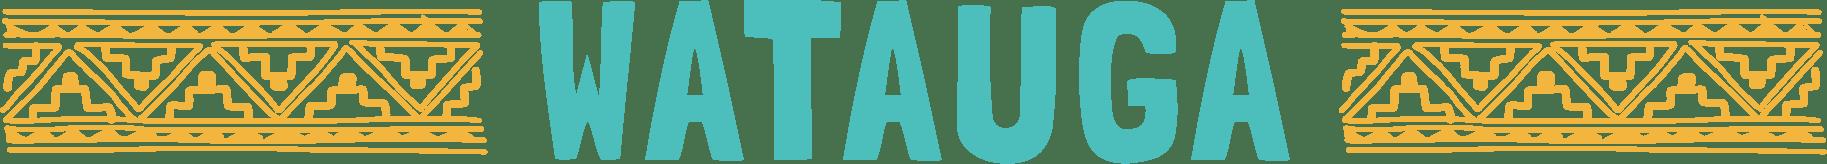 watauga-header-banner